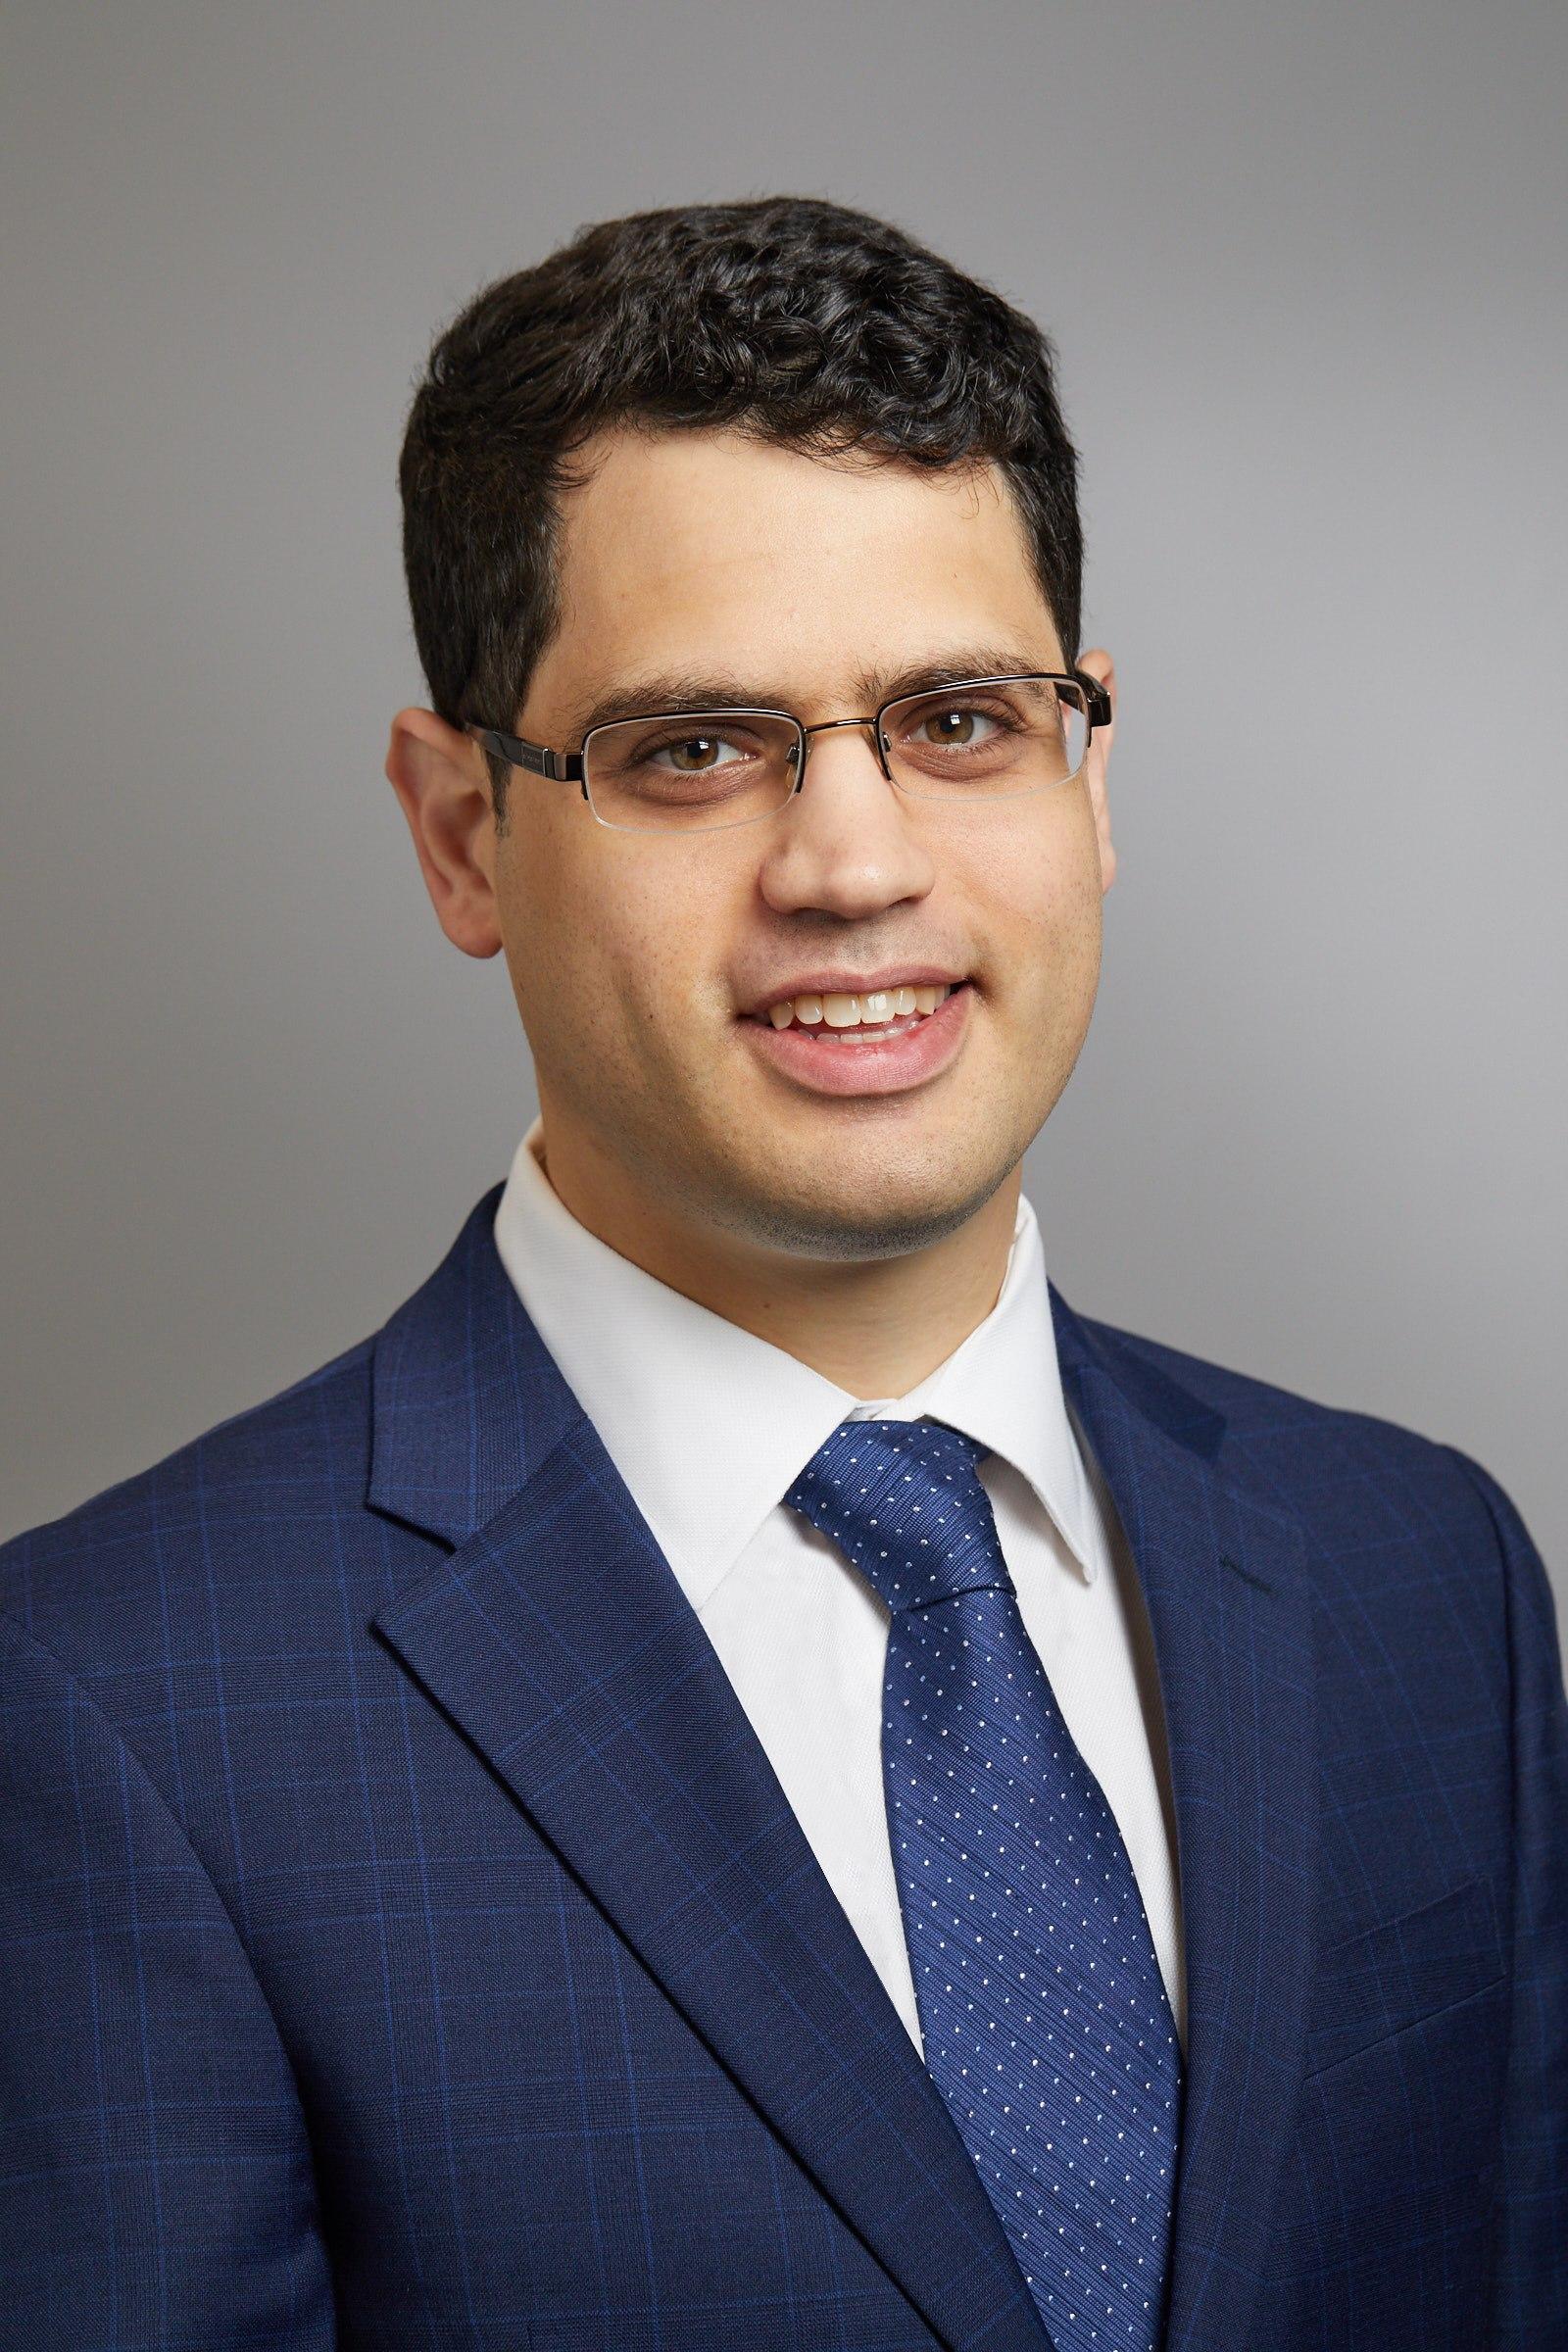 Daniel Wiznia, MD